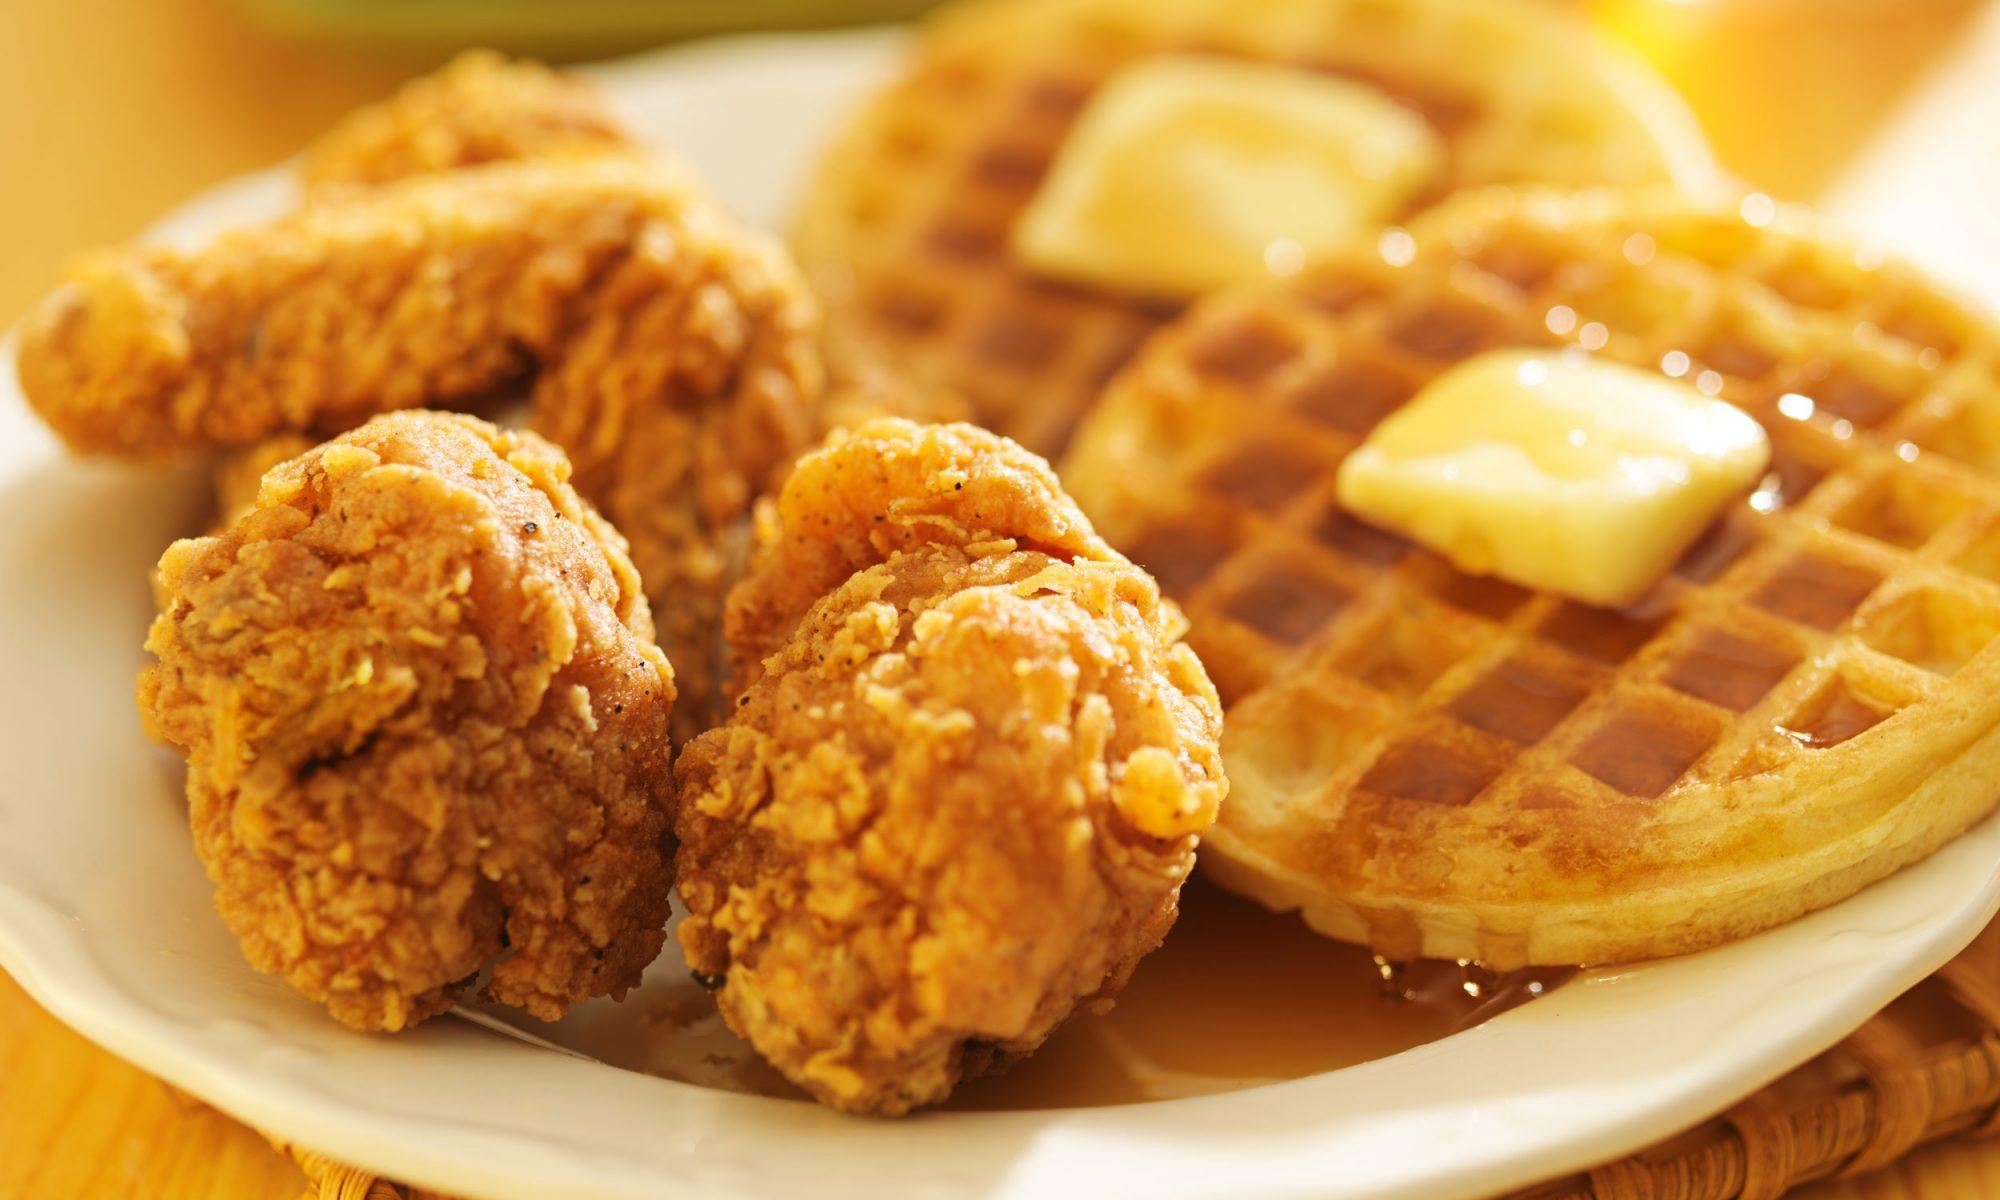 EC: Why Humans Love Crispy Food So Much